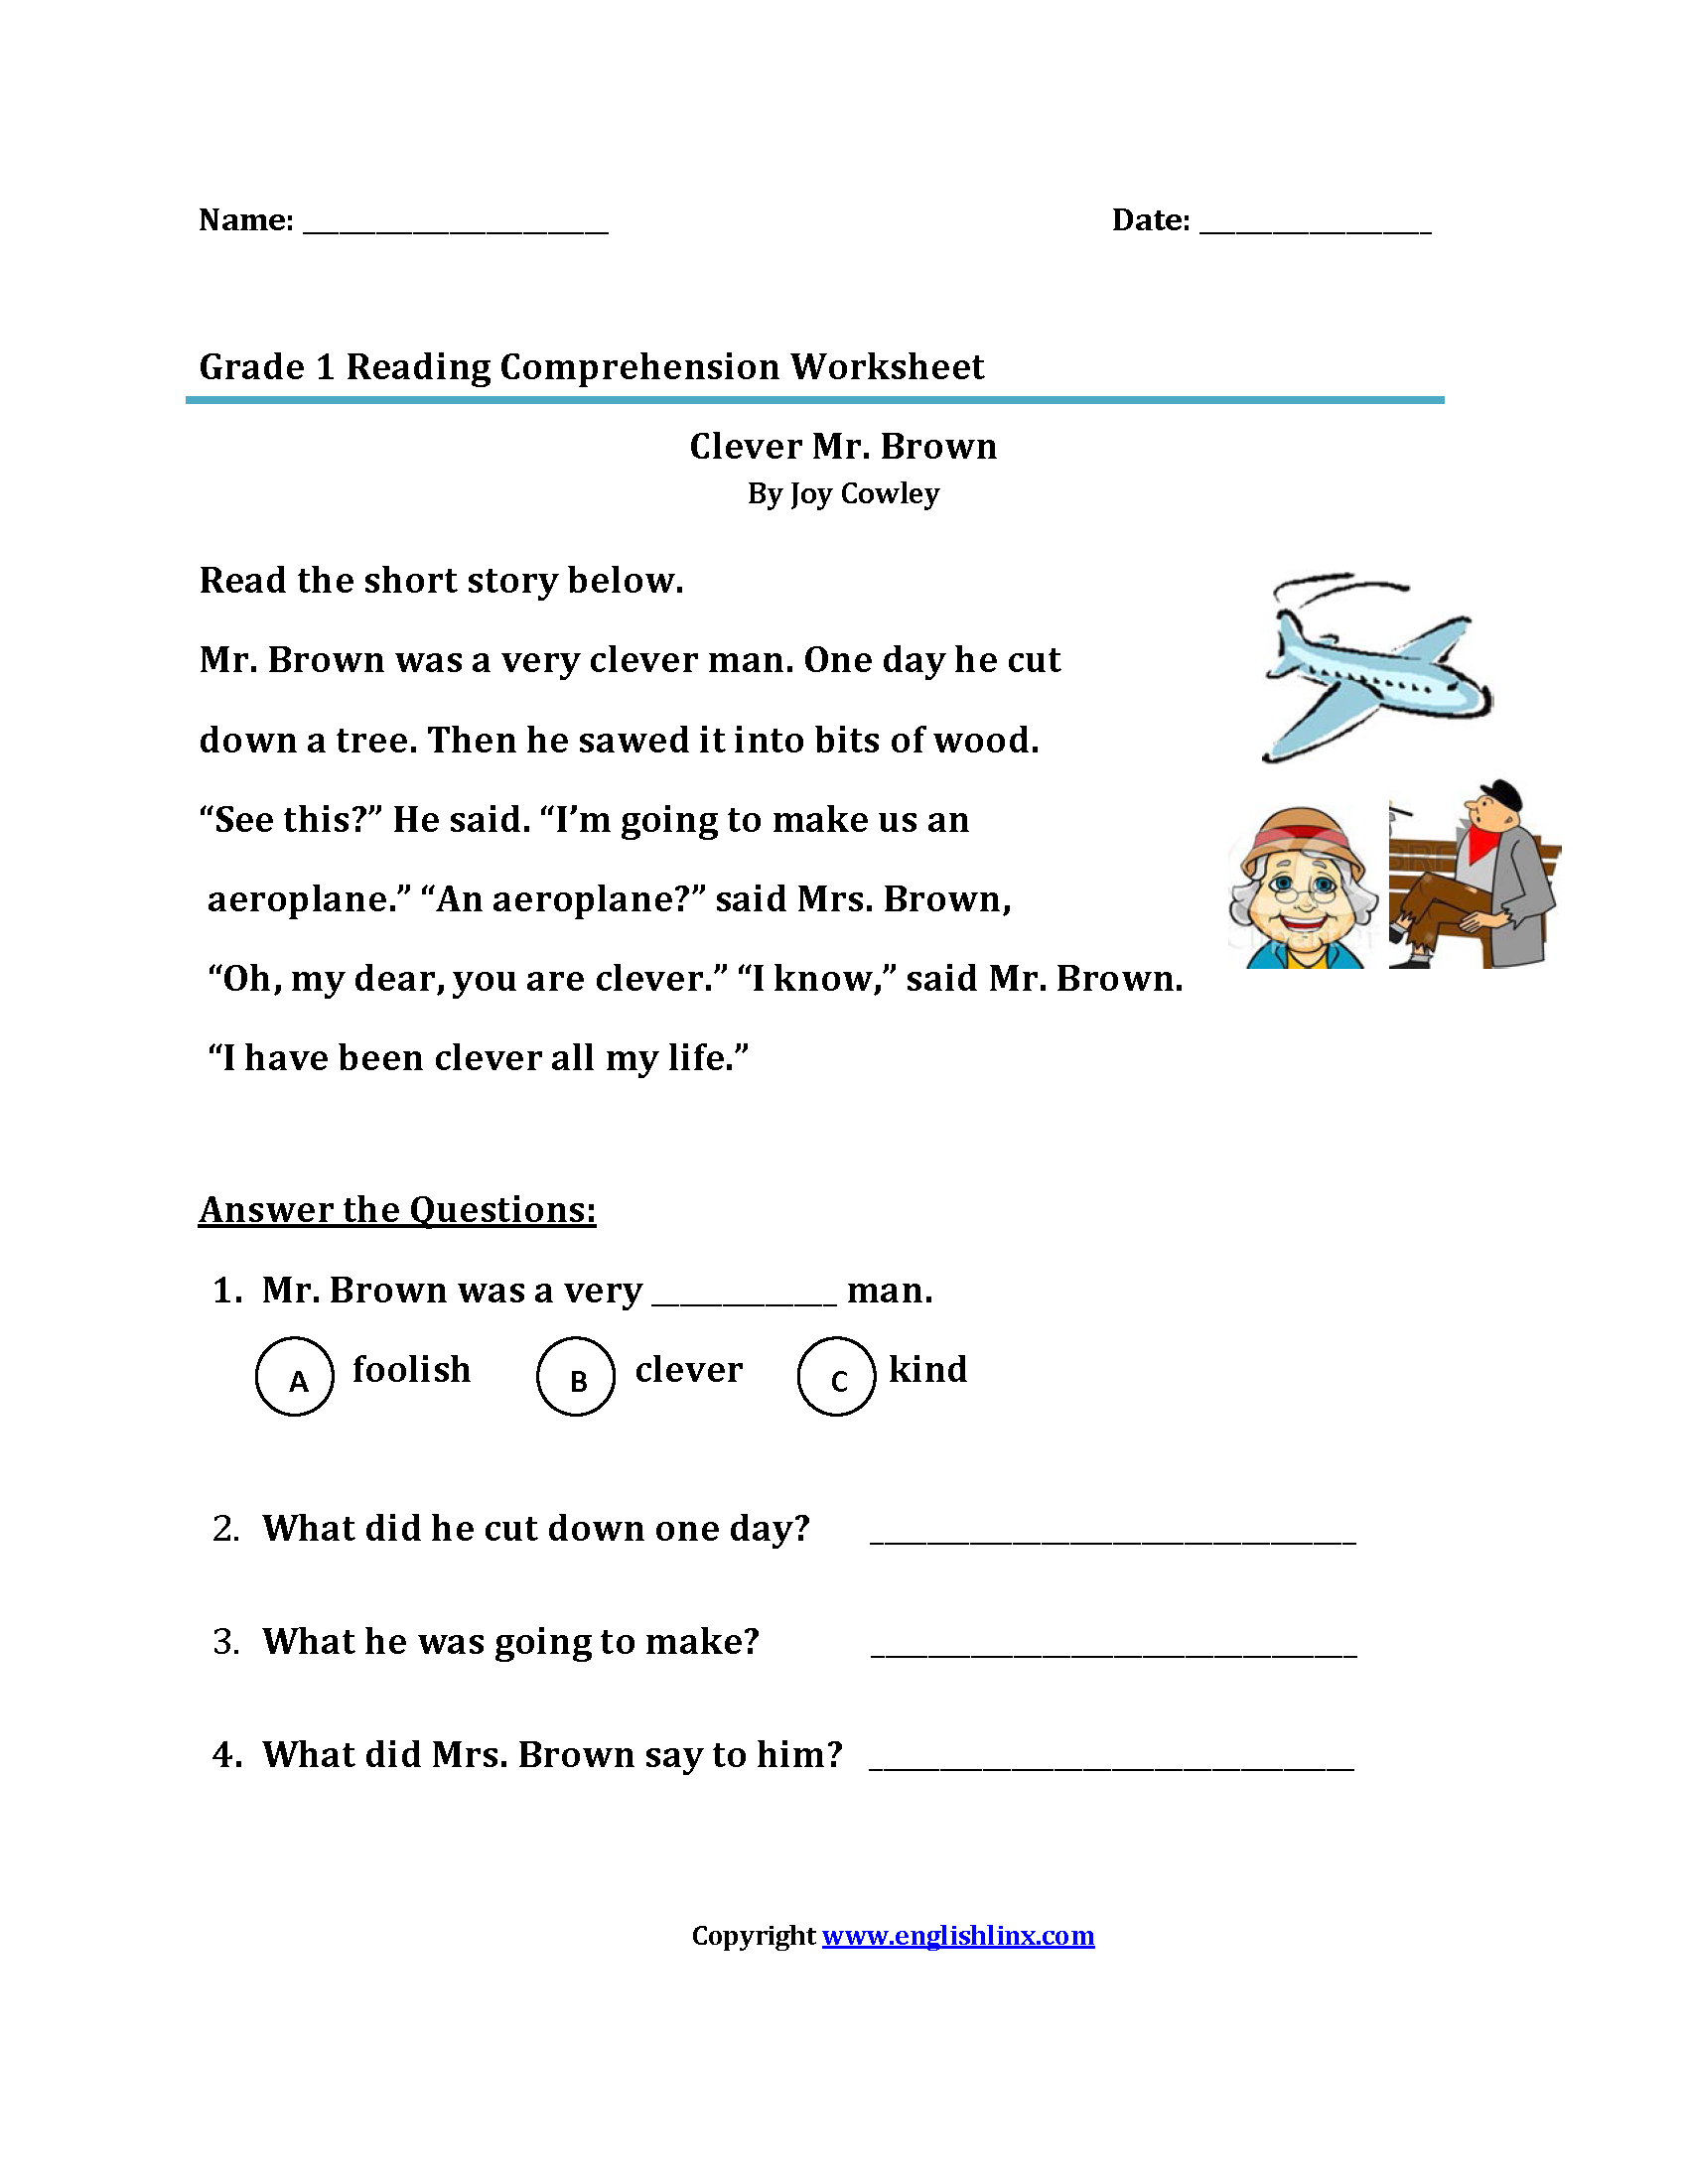 Worksheets Reading Worksheets For 1st Graders Printable clever mr brownfirst grade reading worksheets days of the worksheets